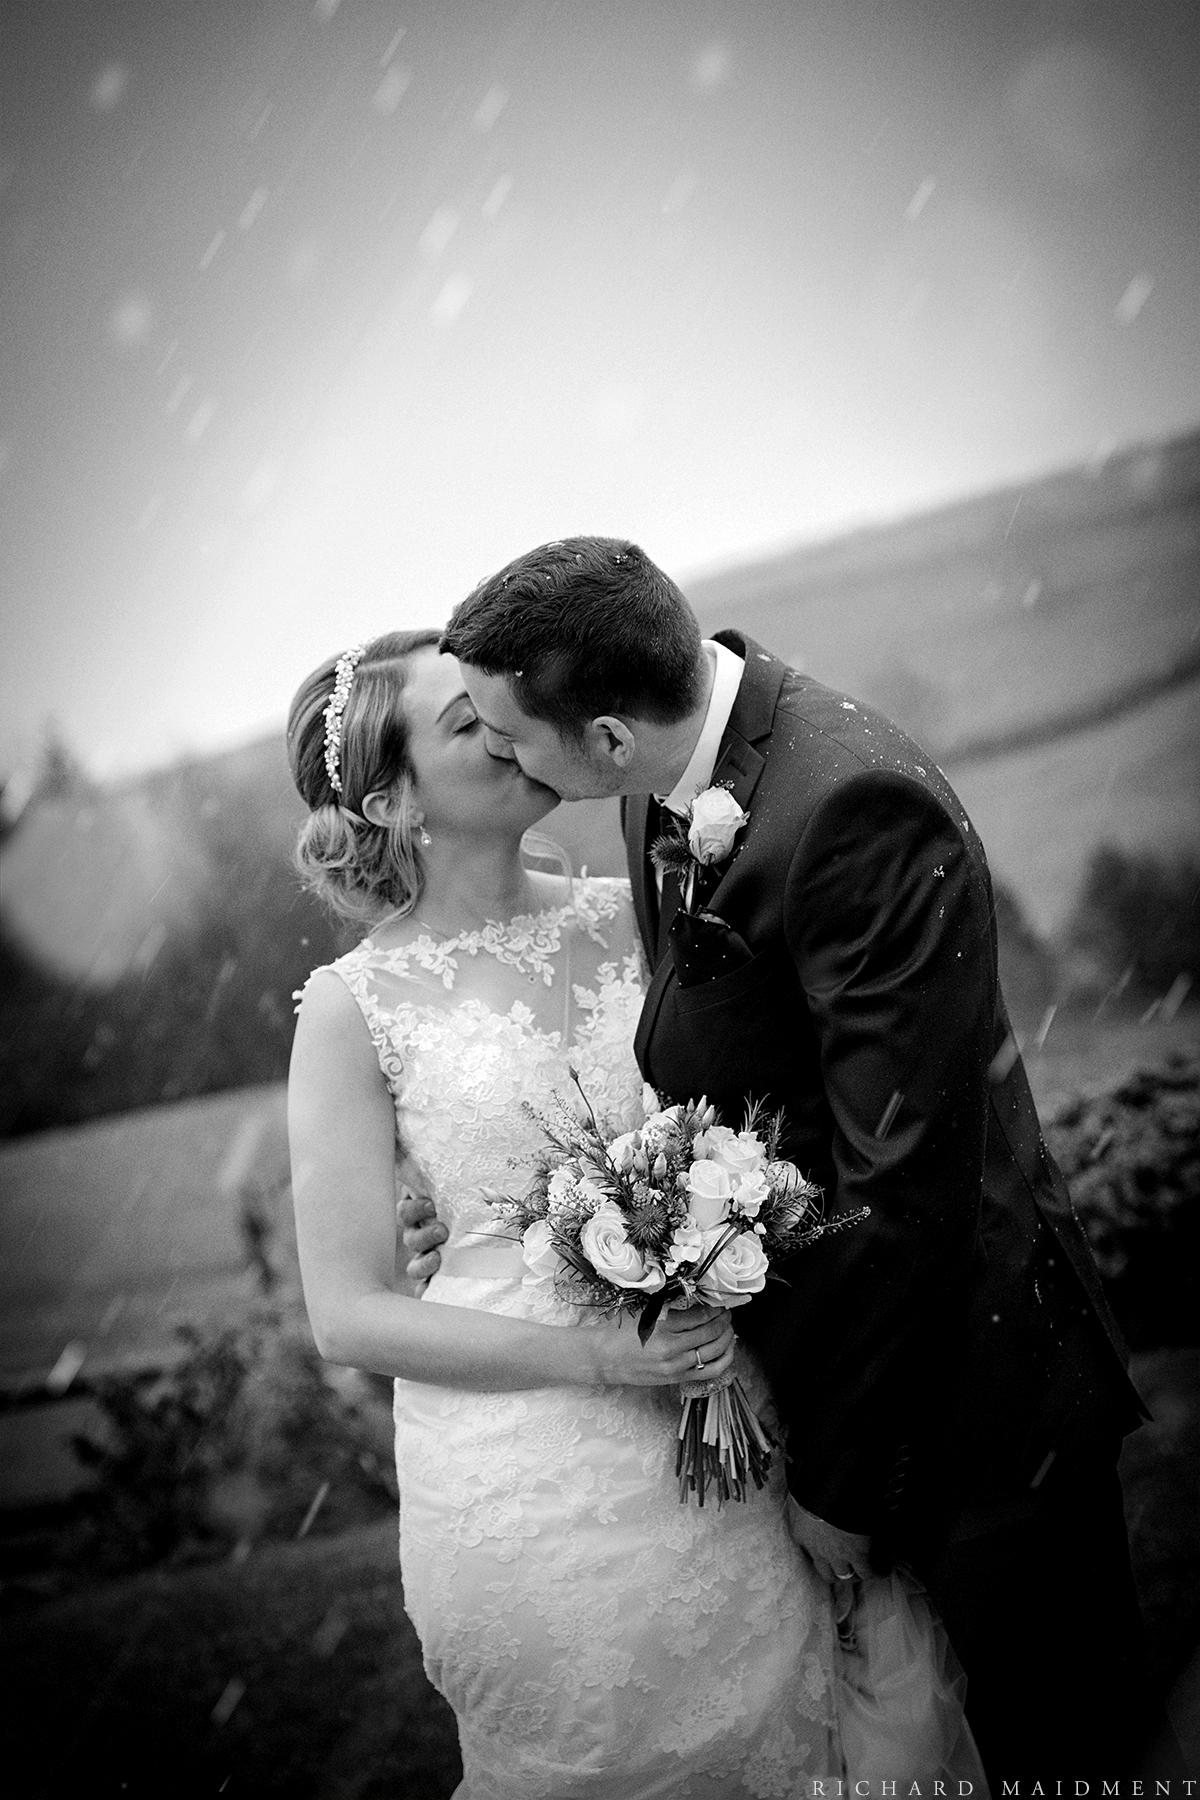 Richard Maidment - Wedding Photography (25).jpg